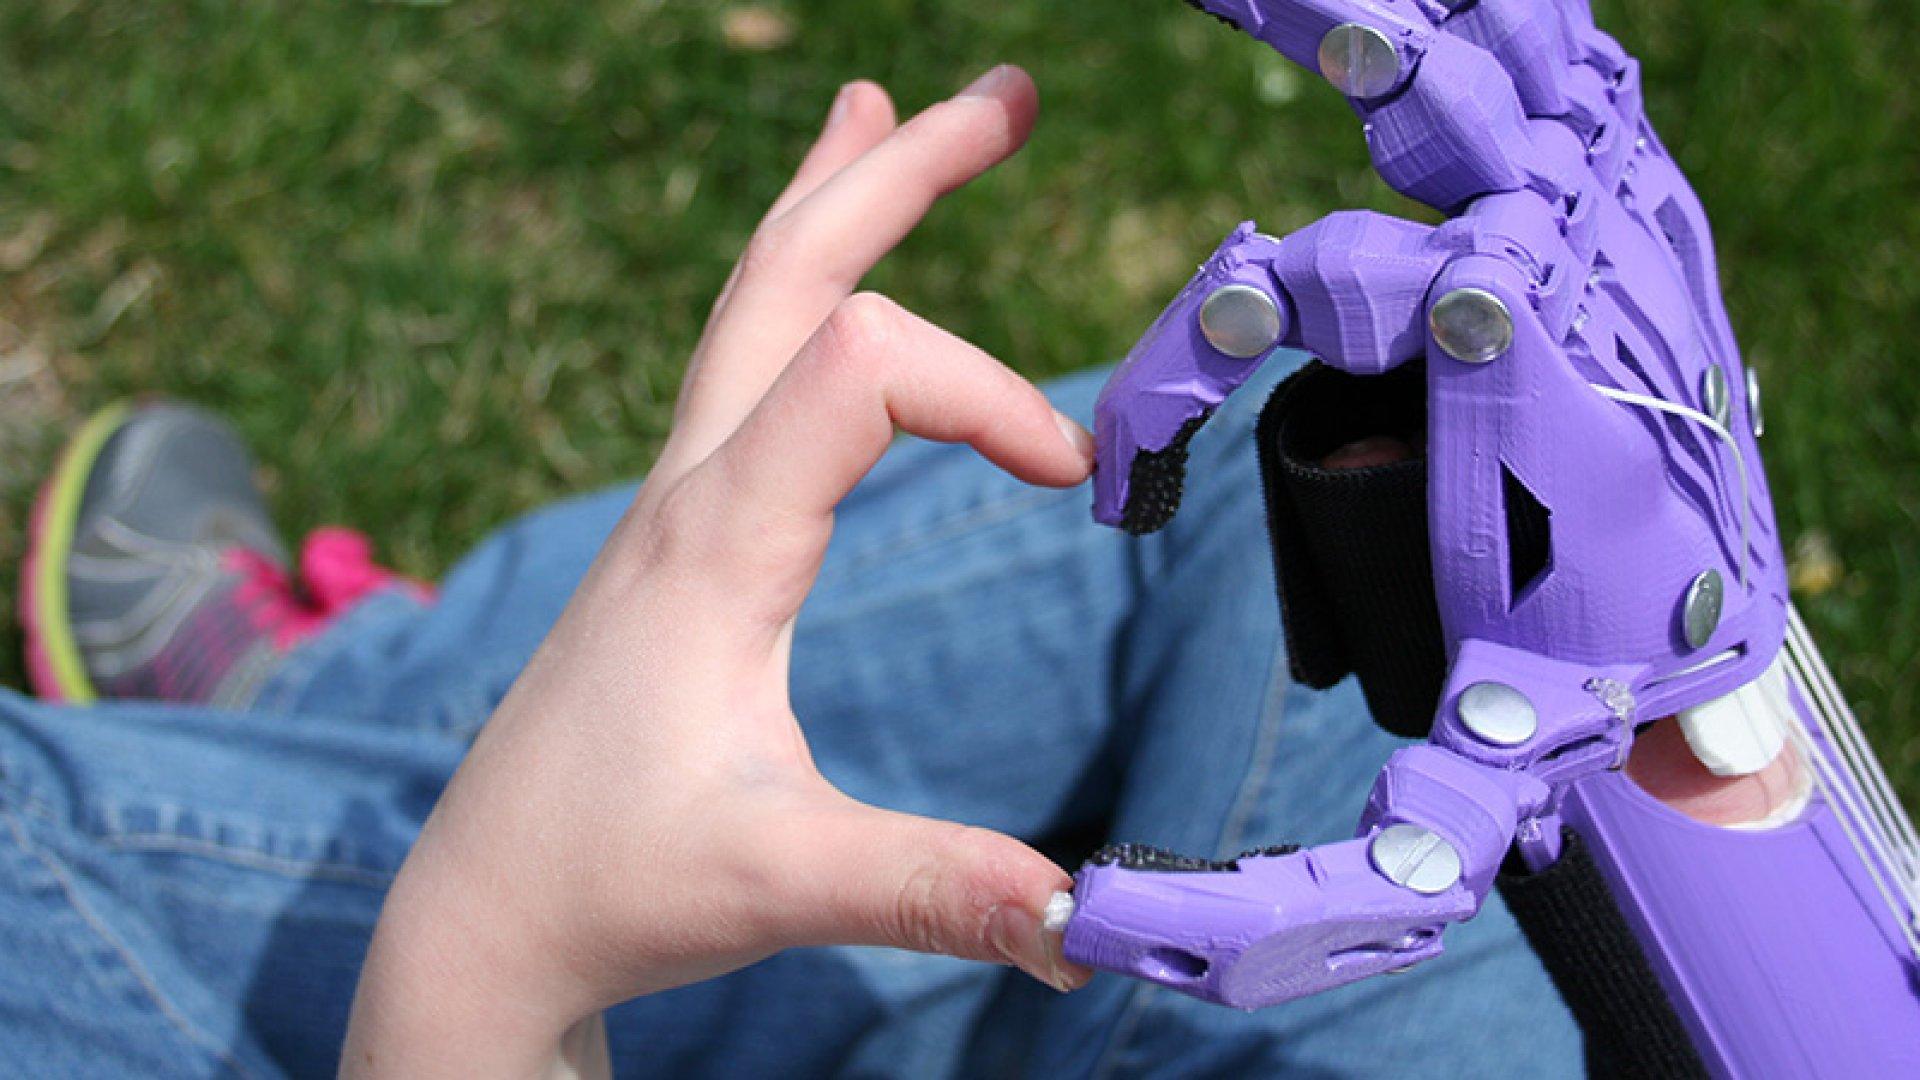 3-D Printing Creates 'Robohand' for Little Girl